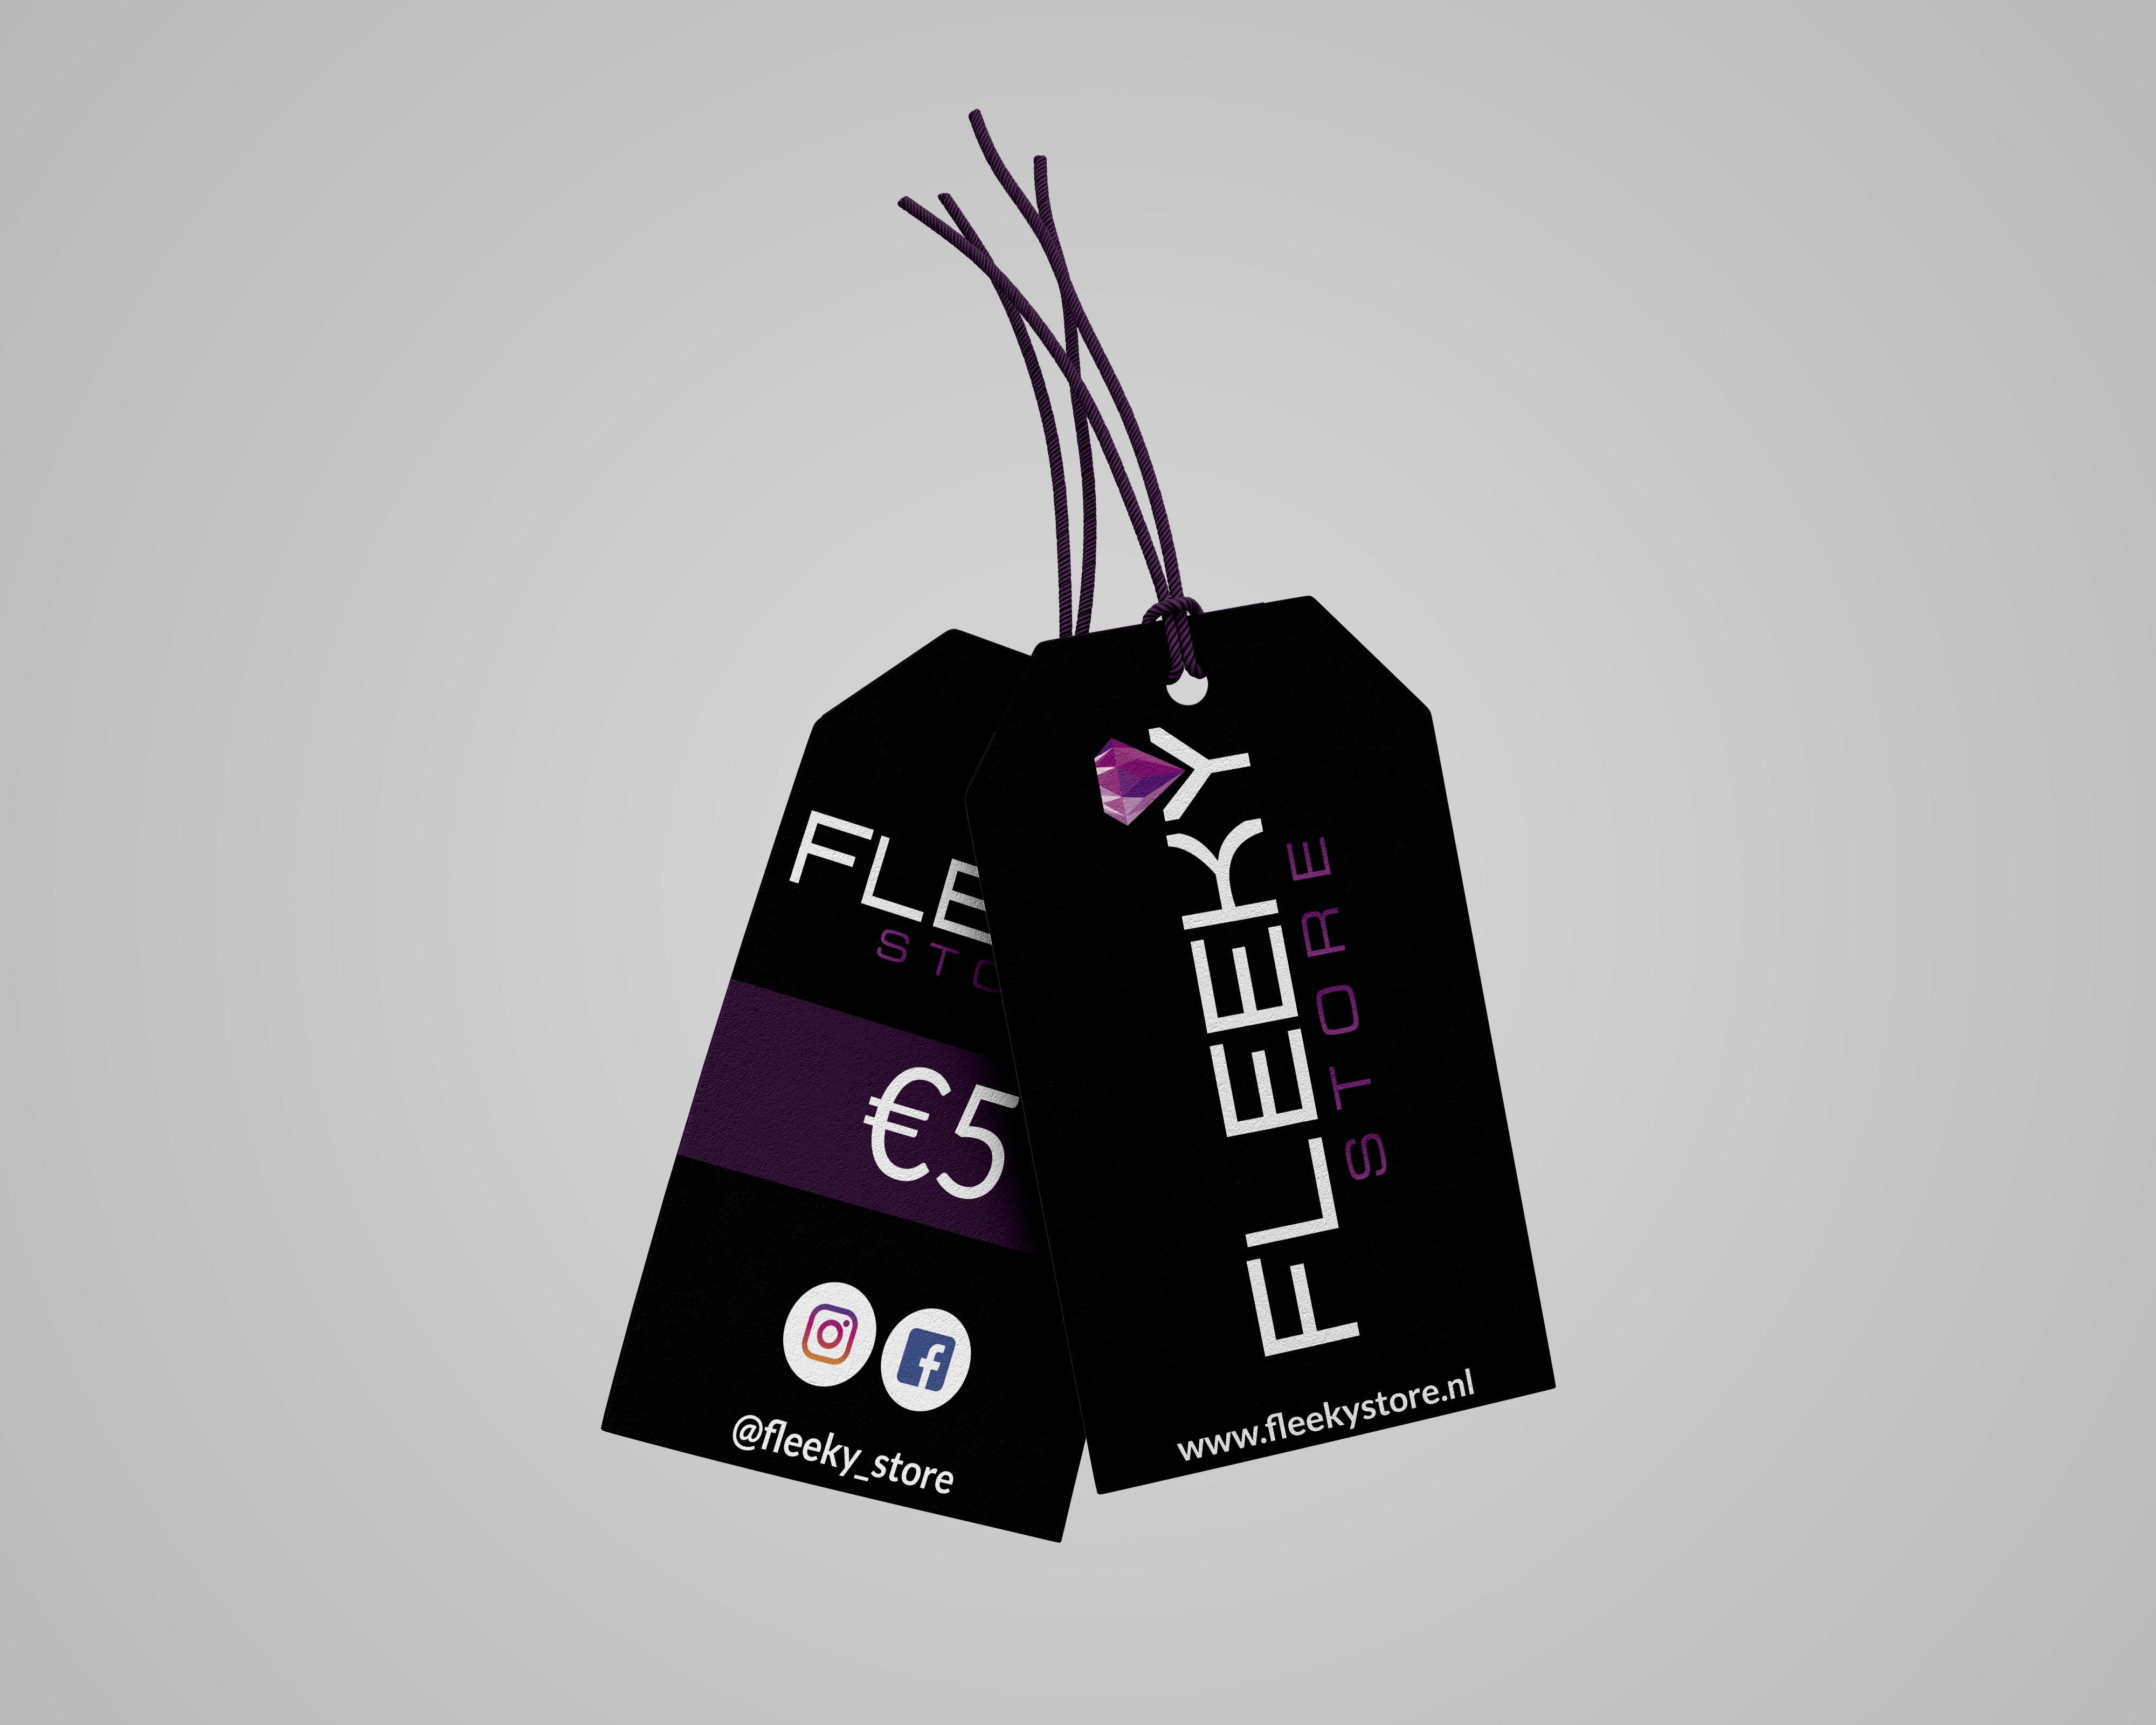 FLEEKY Price Tag Design